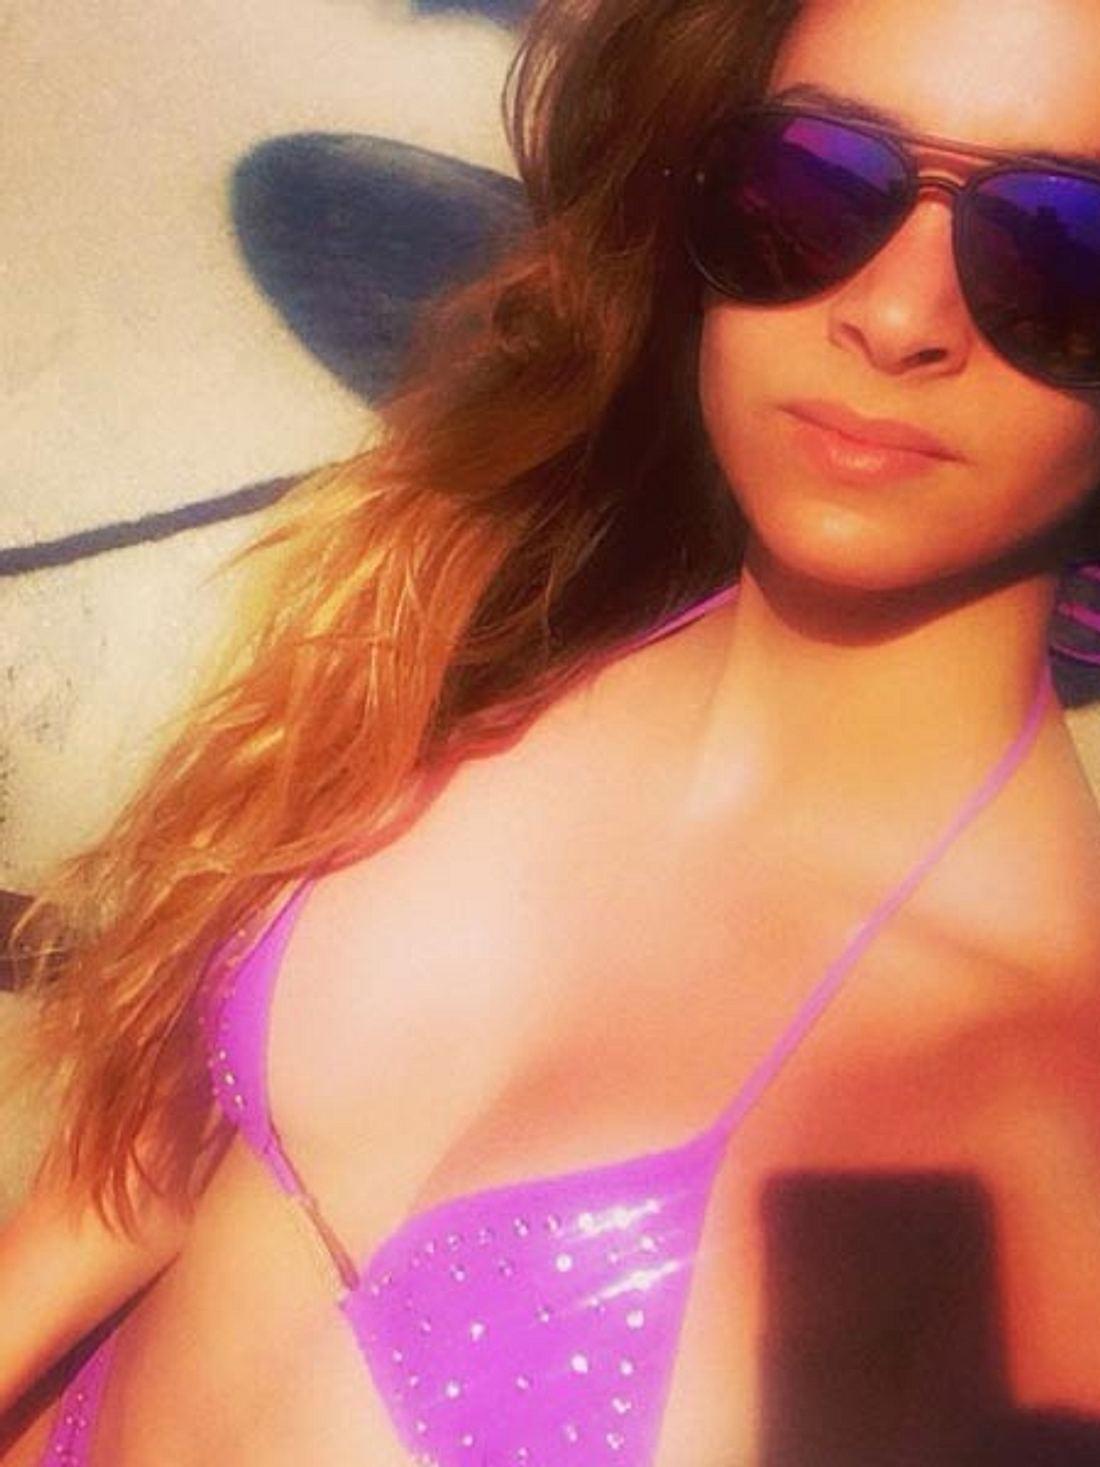 Sila Sahin & Co.: Die sexy Busen-Selfies der Stars